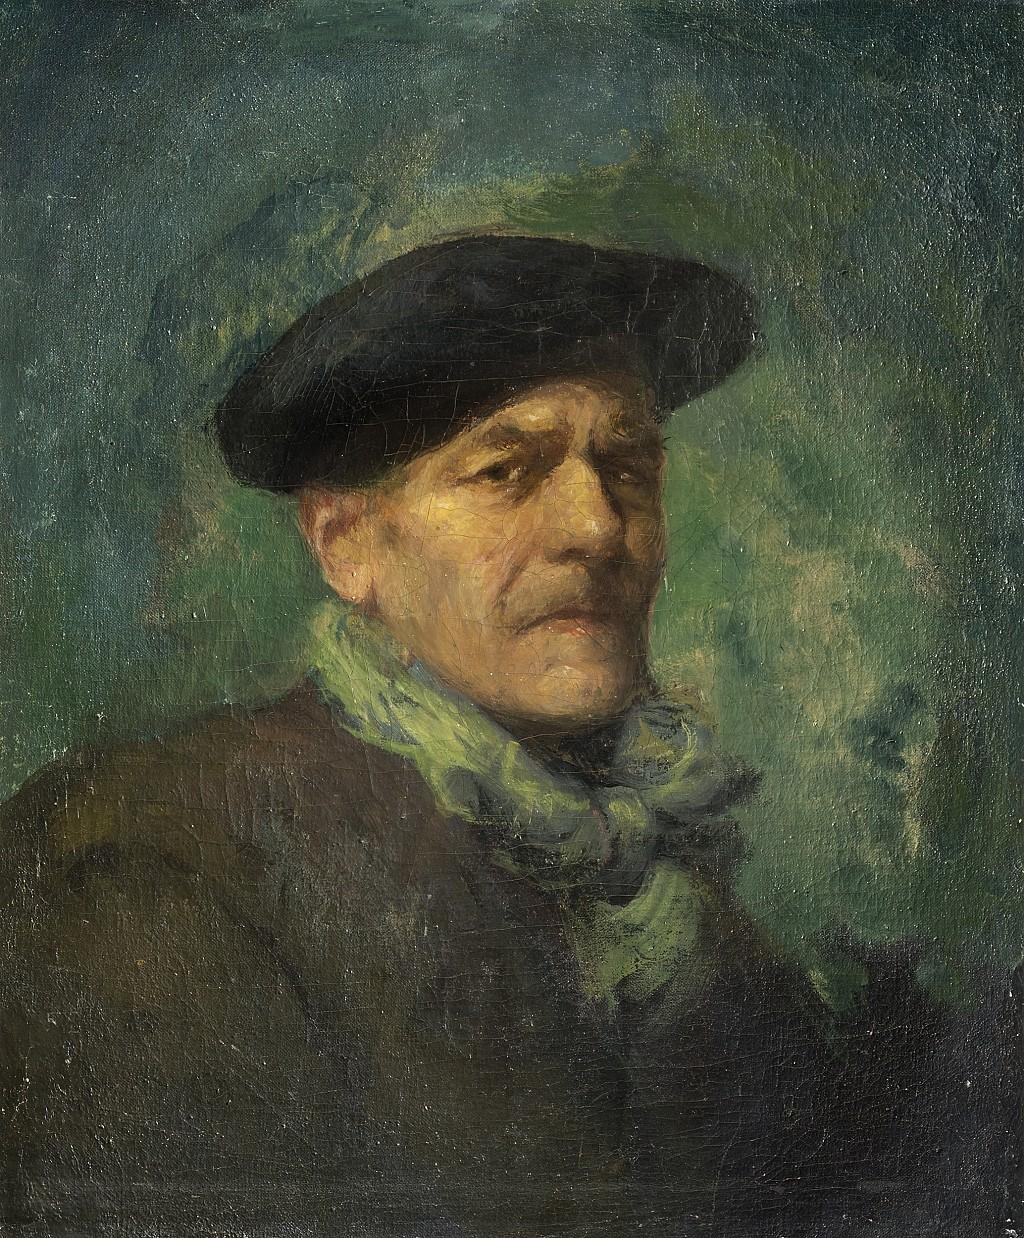 Шмаров Павел Дмитриевич «Обнаженная» 1930-е